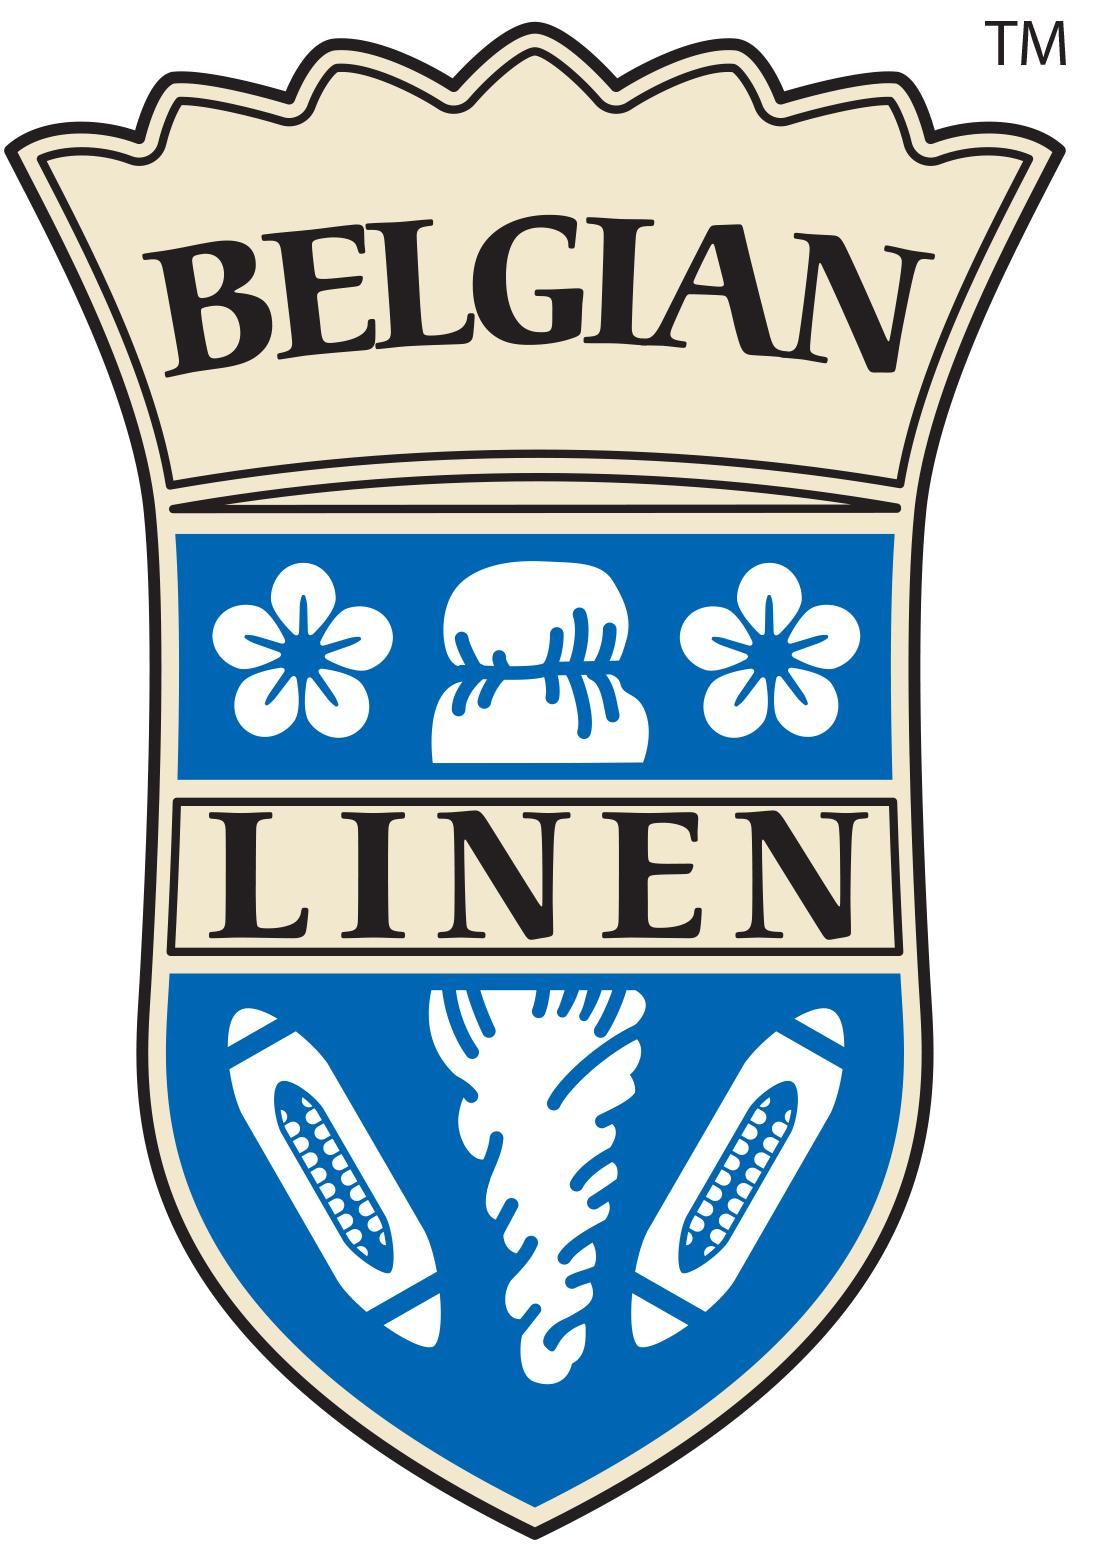 """By choosing Belgian Linen™, you choose for the finest Linen in the world."" -Belgian Flax & Linen Association"